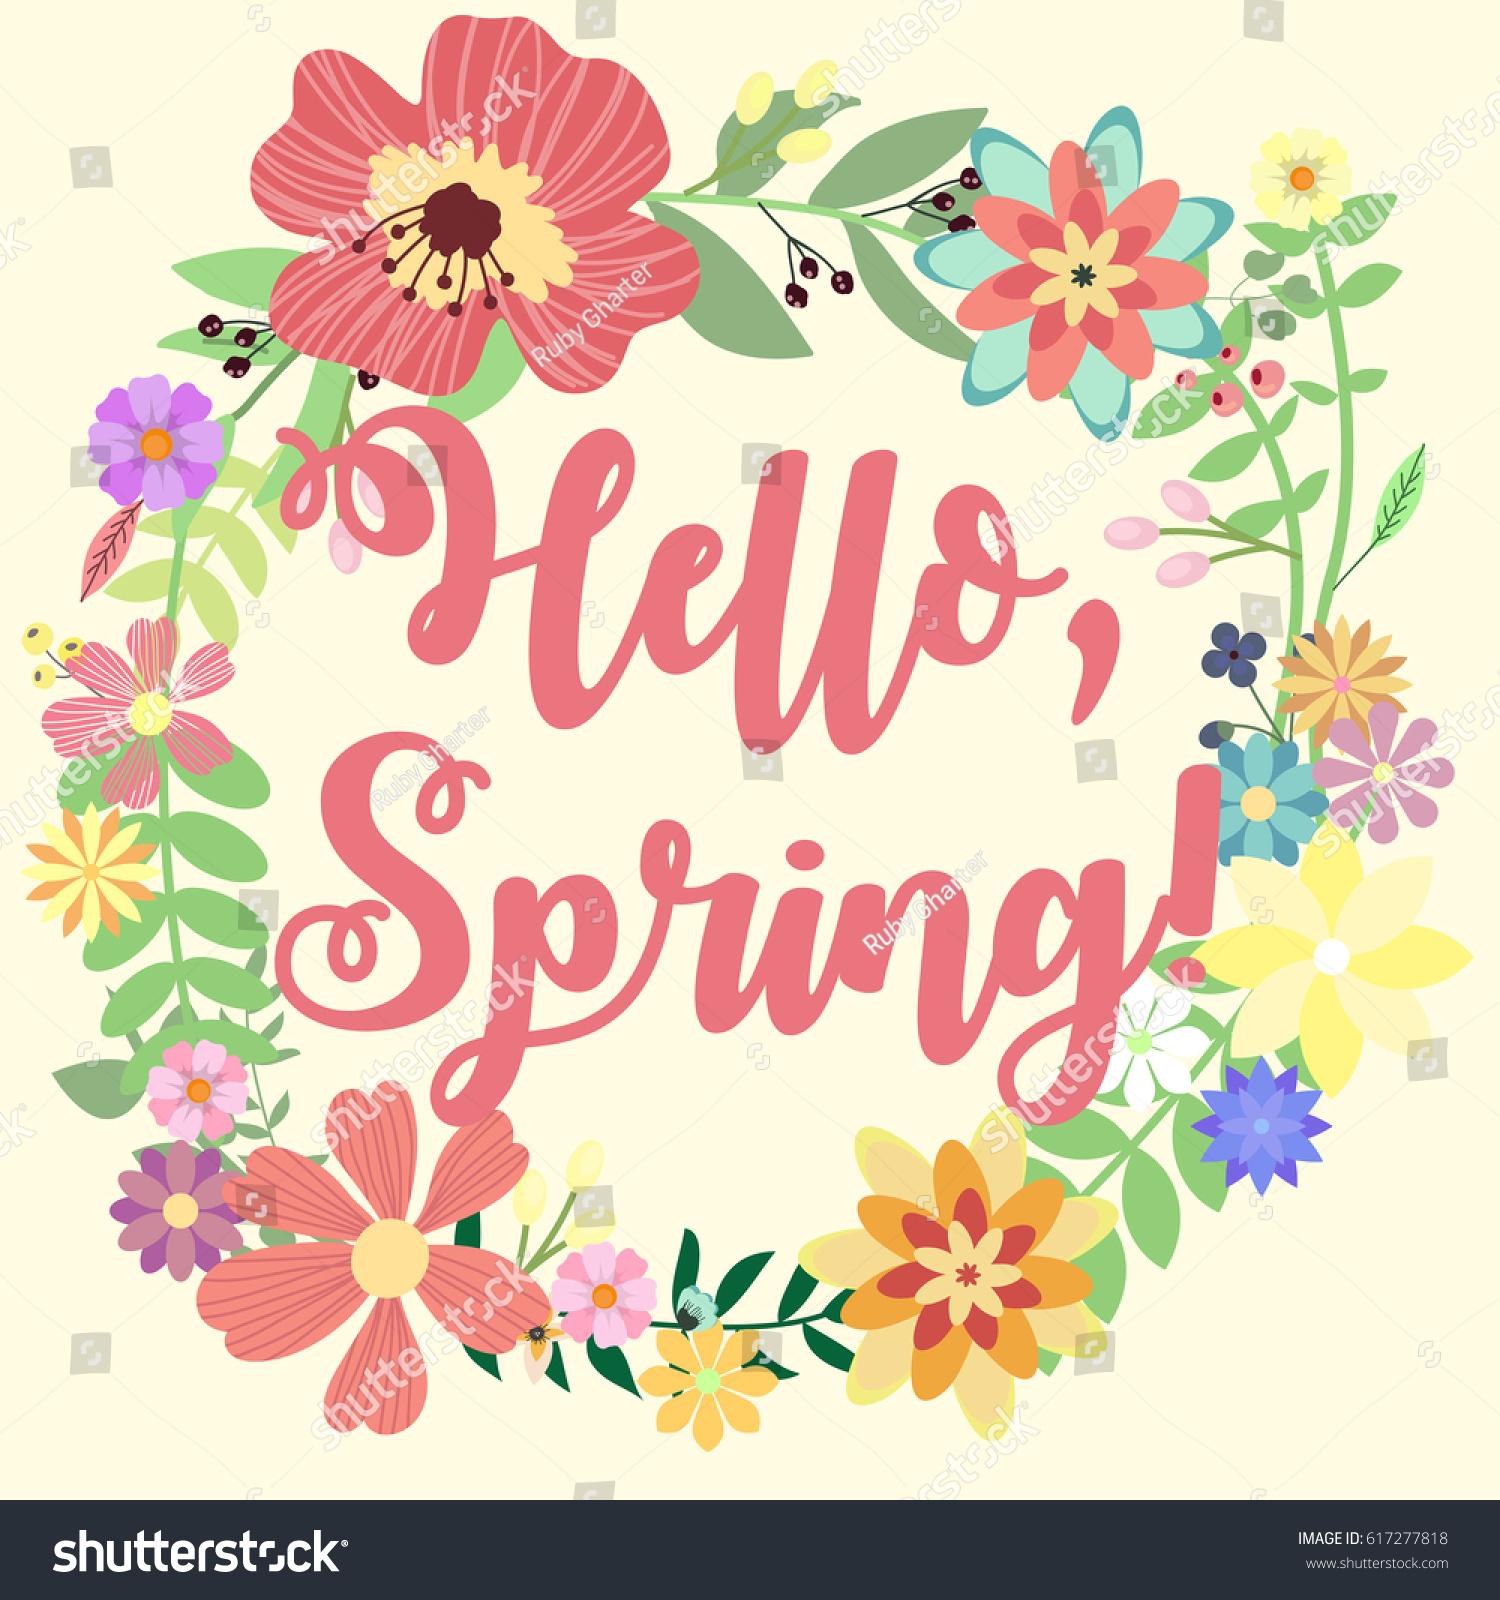 Colorful U0027Hello Springu0027 Vector Card For Flyers, Invitation, Posters,  Brochure,